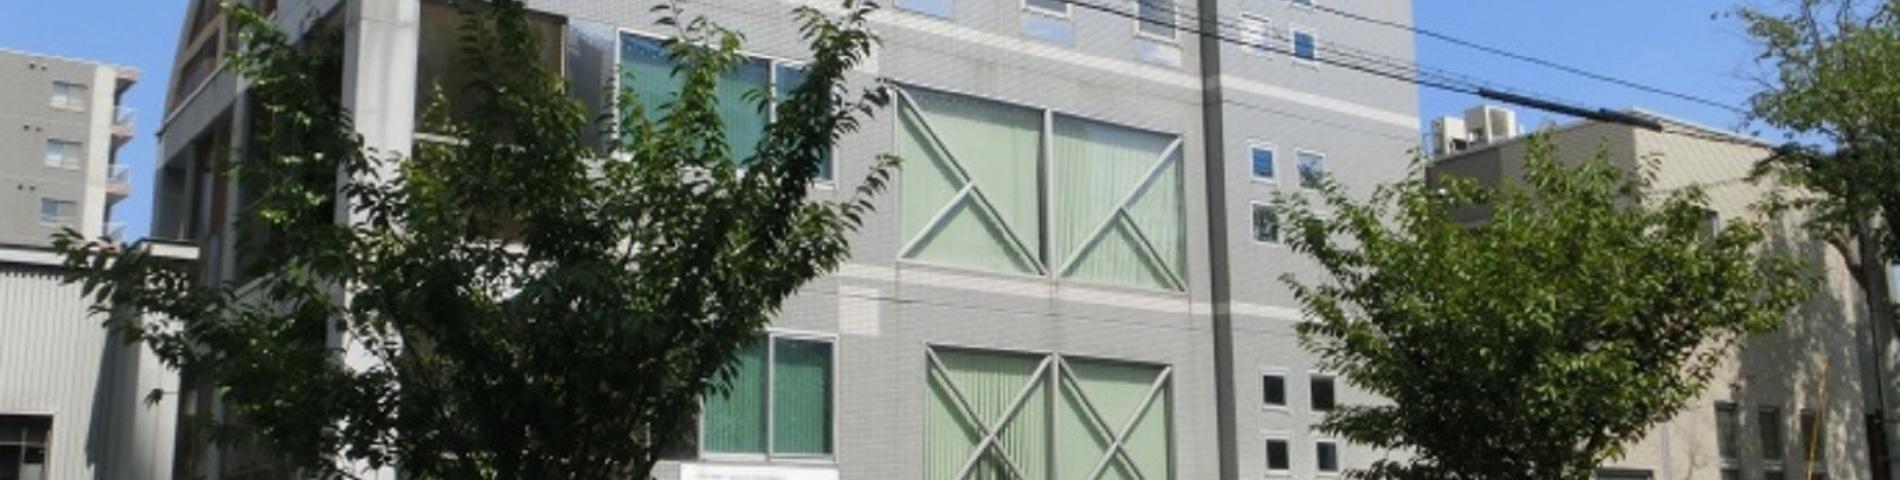 Japanese Language Institute of Sapporo afbeelding 1